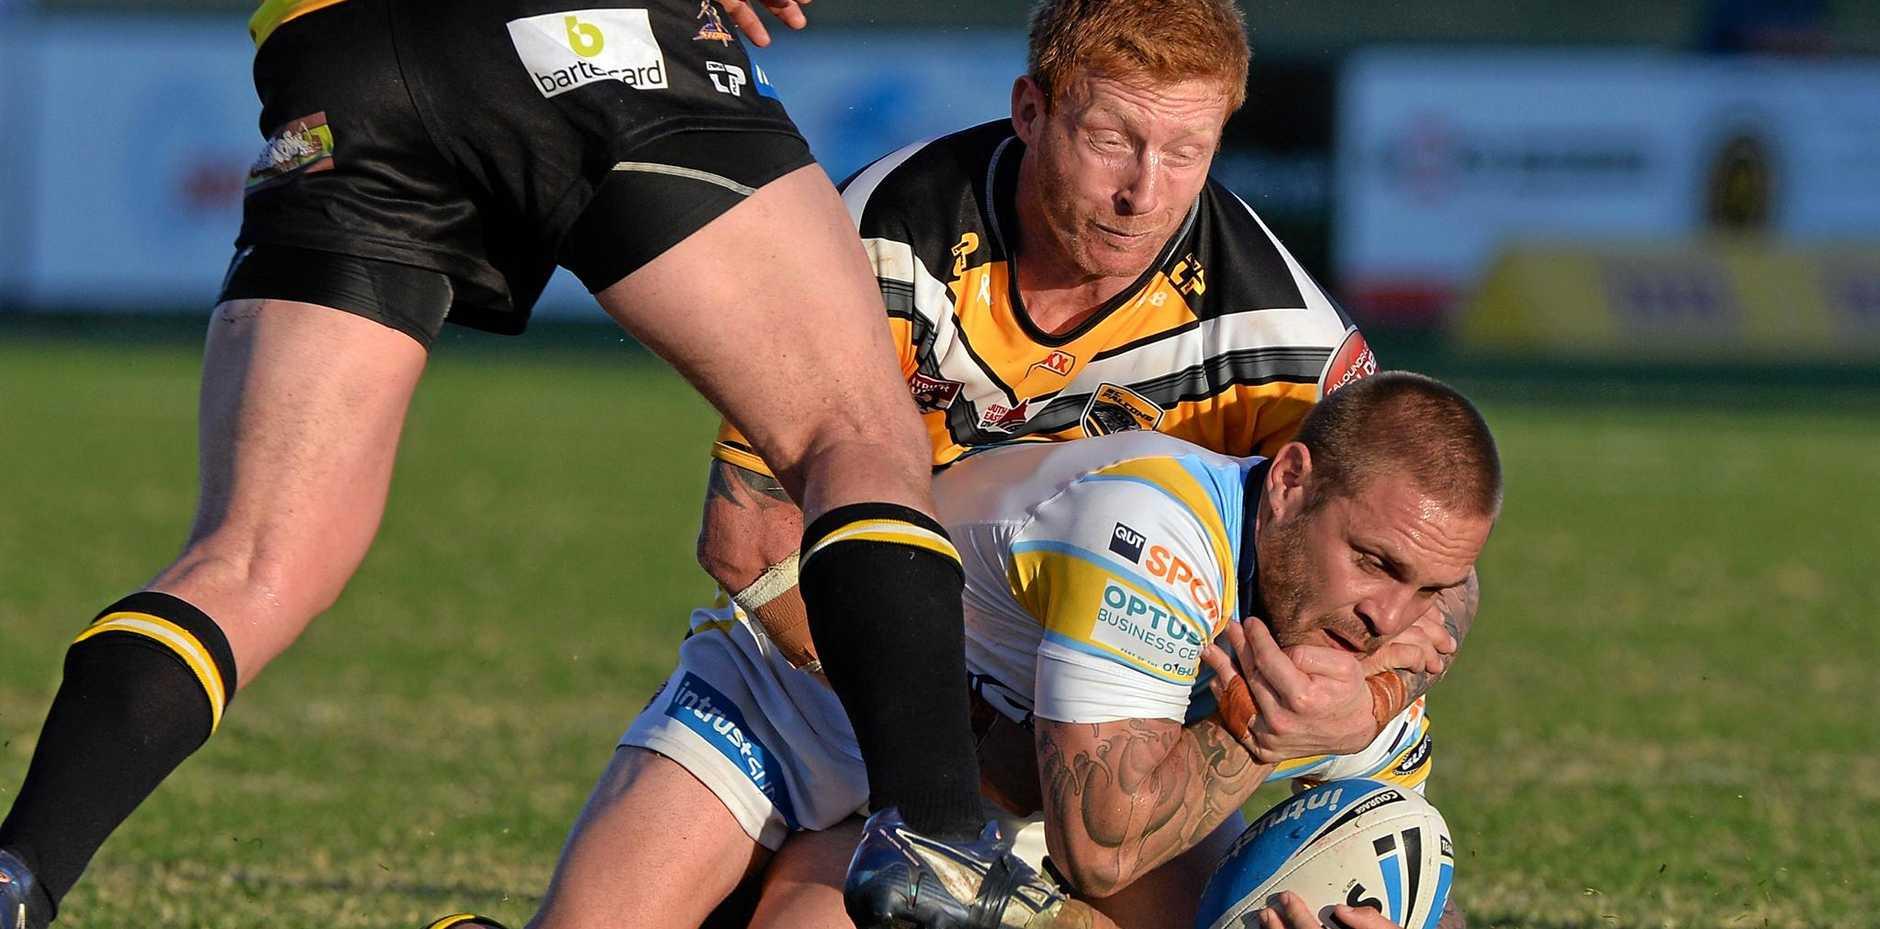 DEFEATED: Sunshine Coast captain Dane Hogan tackles Norths' Danny Kerr.